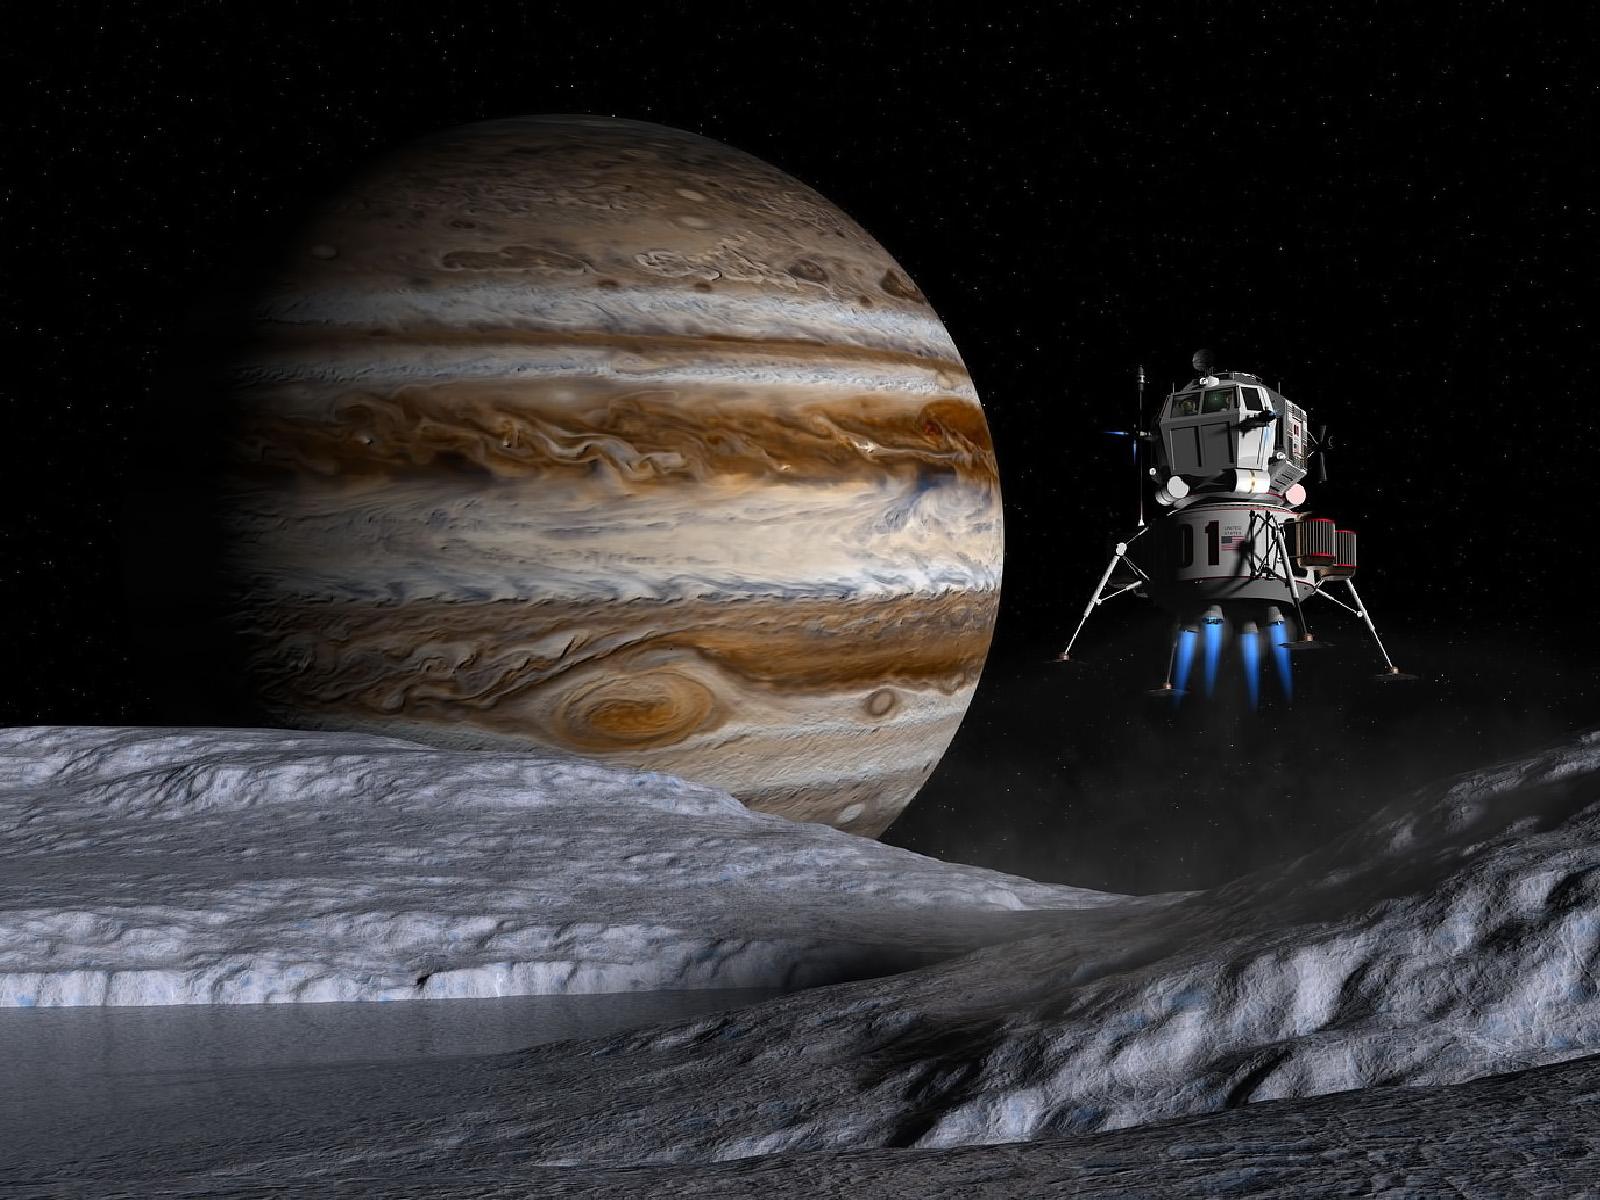 Download High quality Jupiter Europe satellite Science Fiction Sci fi 1600x1200